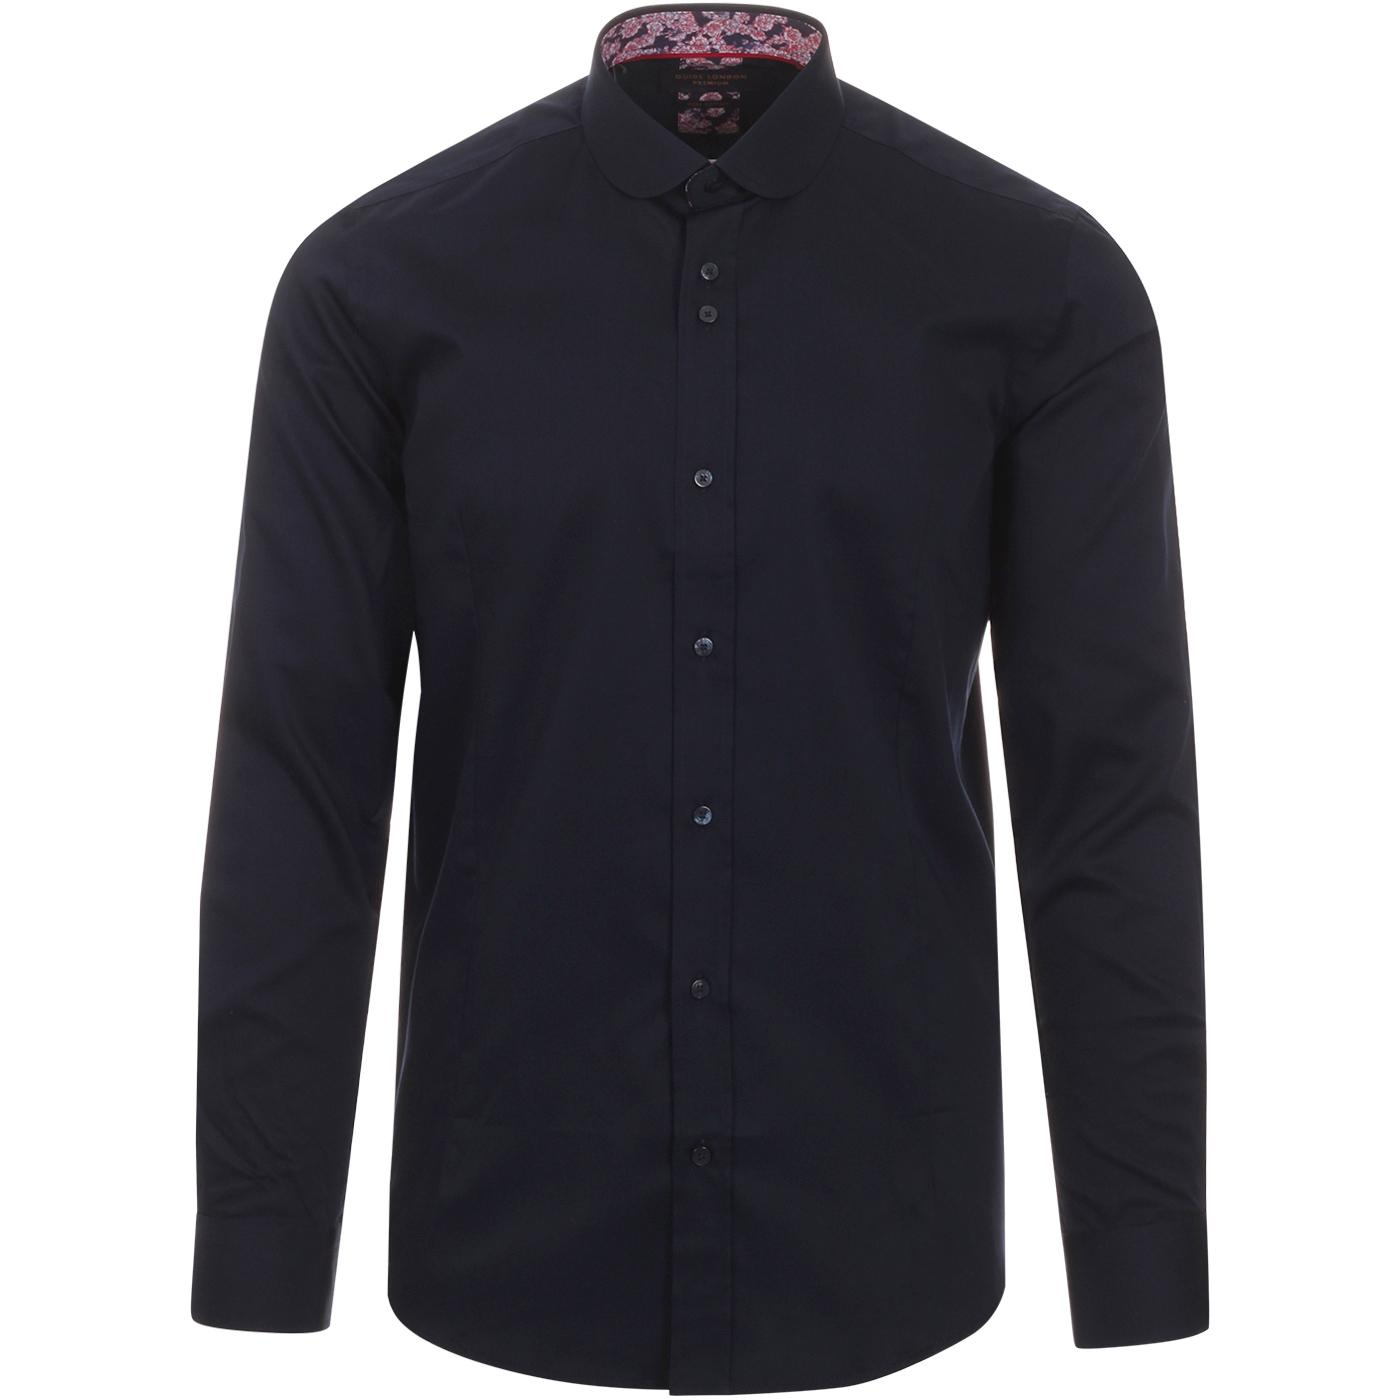 GUIDE LONDON 1960s Mod Round Collar Shirt (Navy)